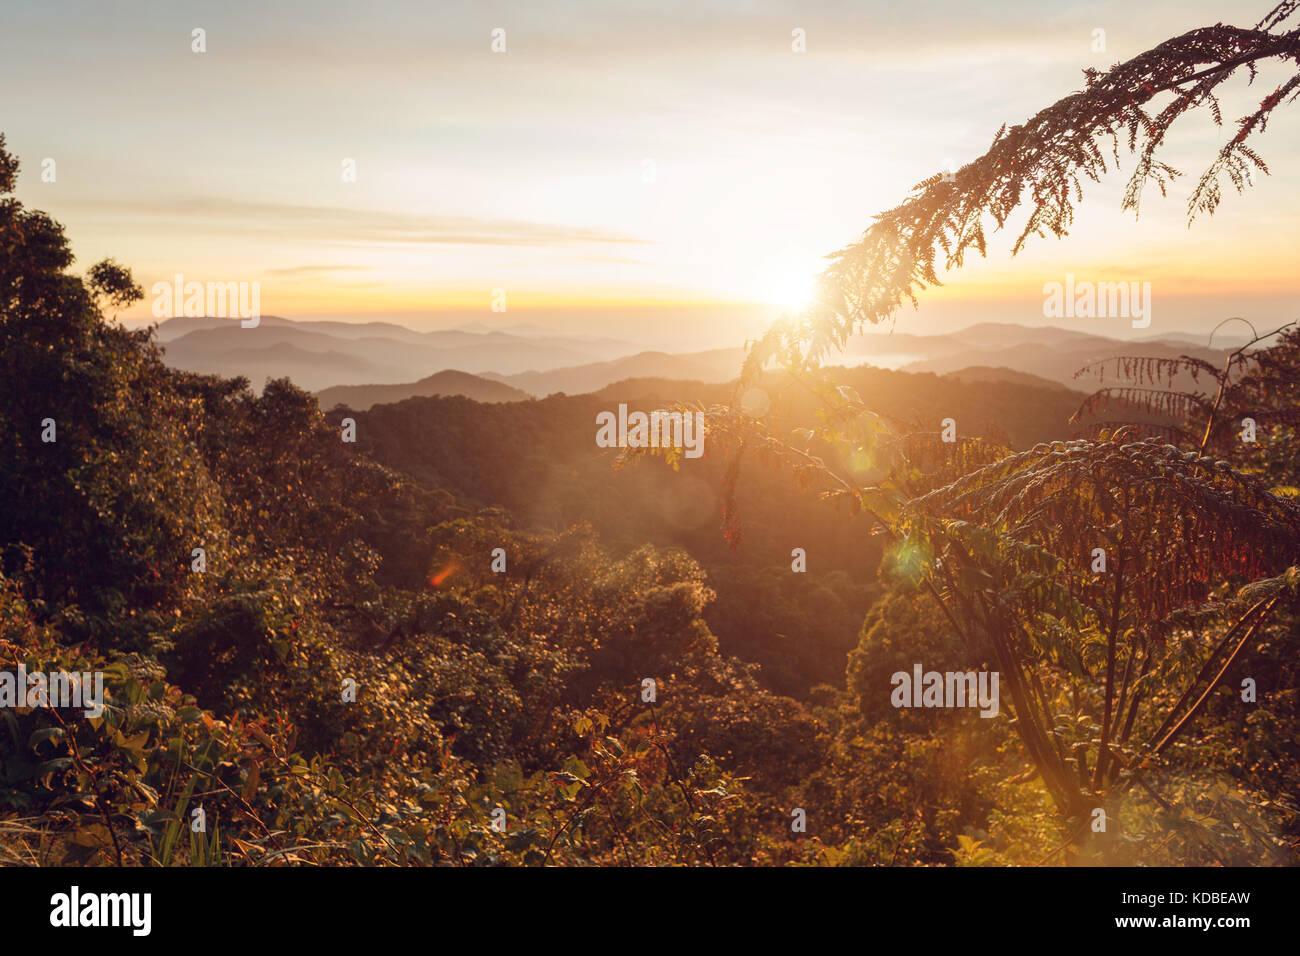 Warm Sunrise in a mountain area in Malaysia - Stock Image